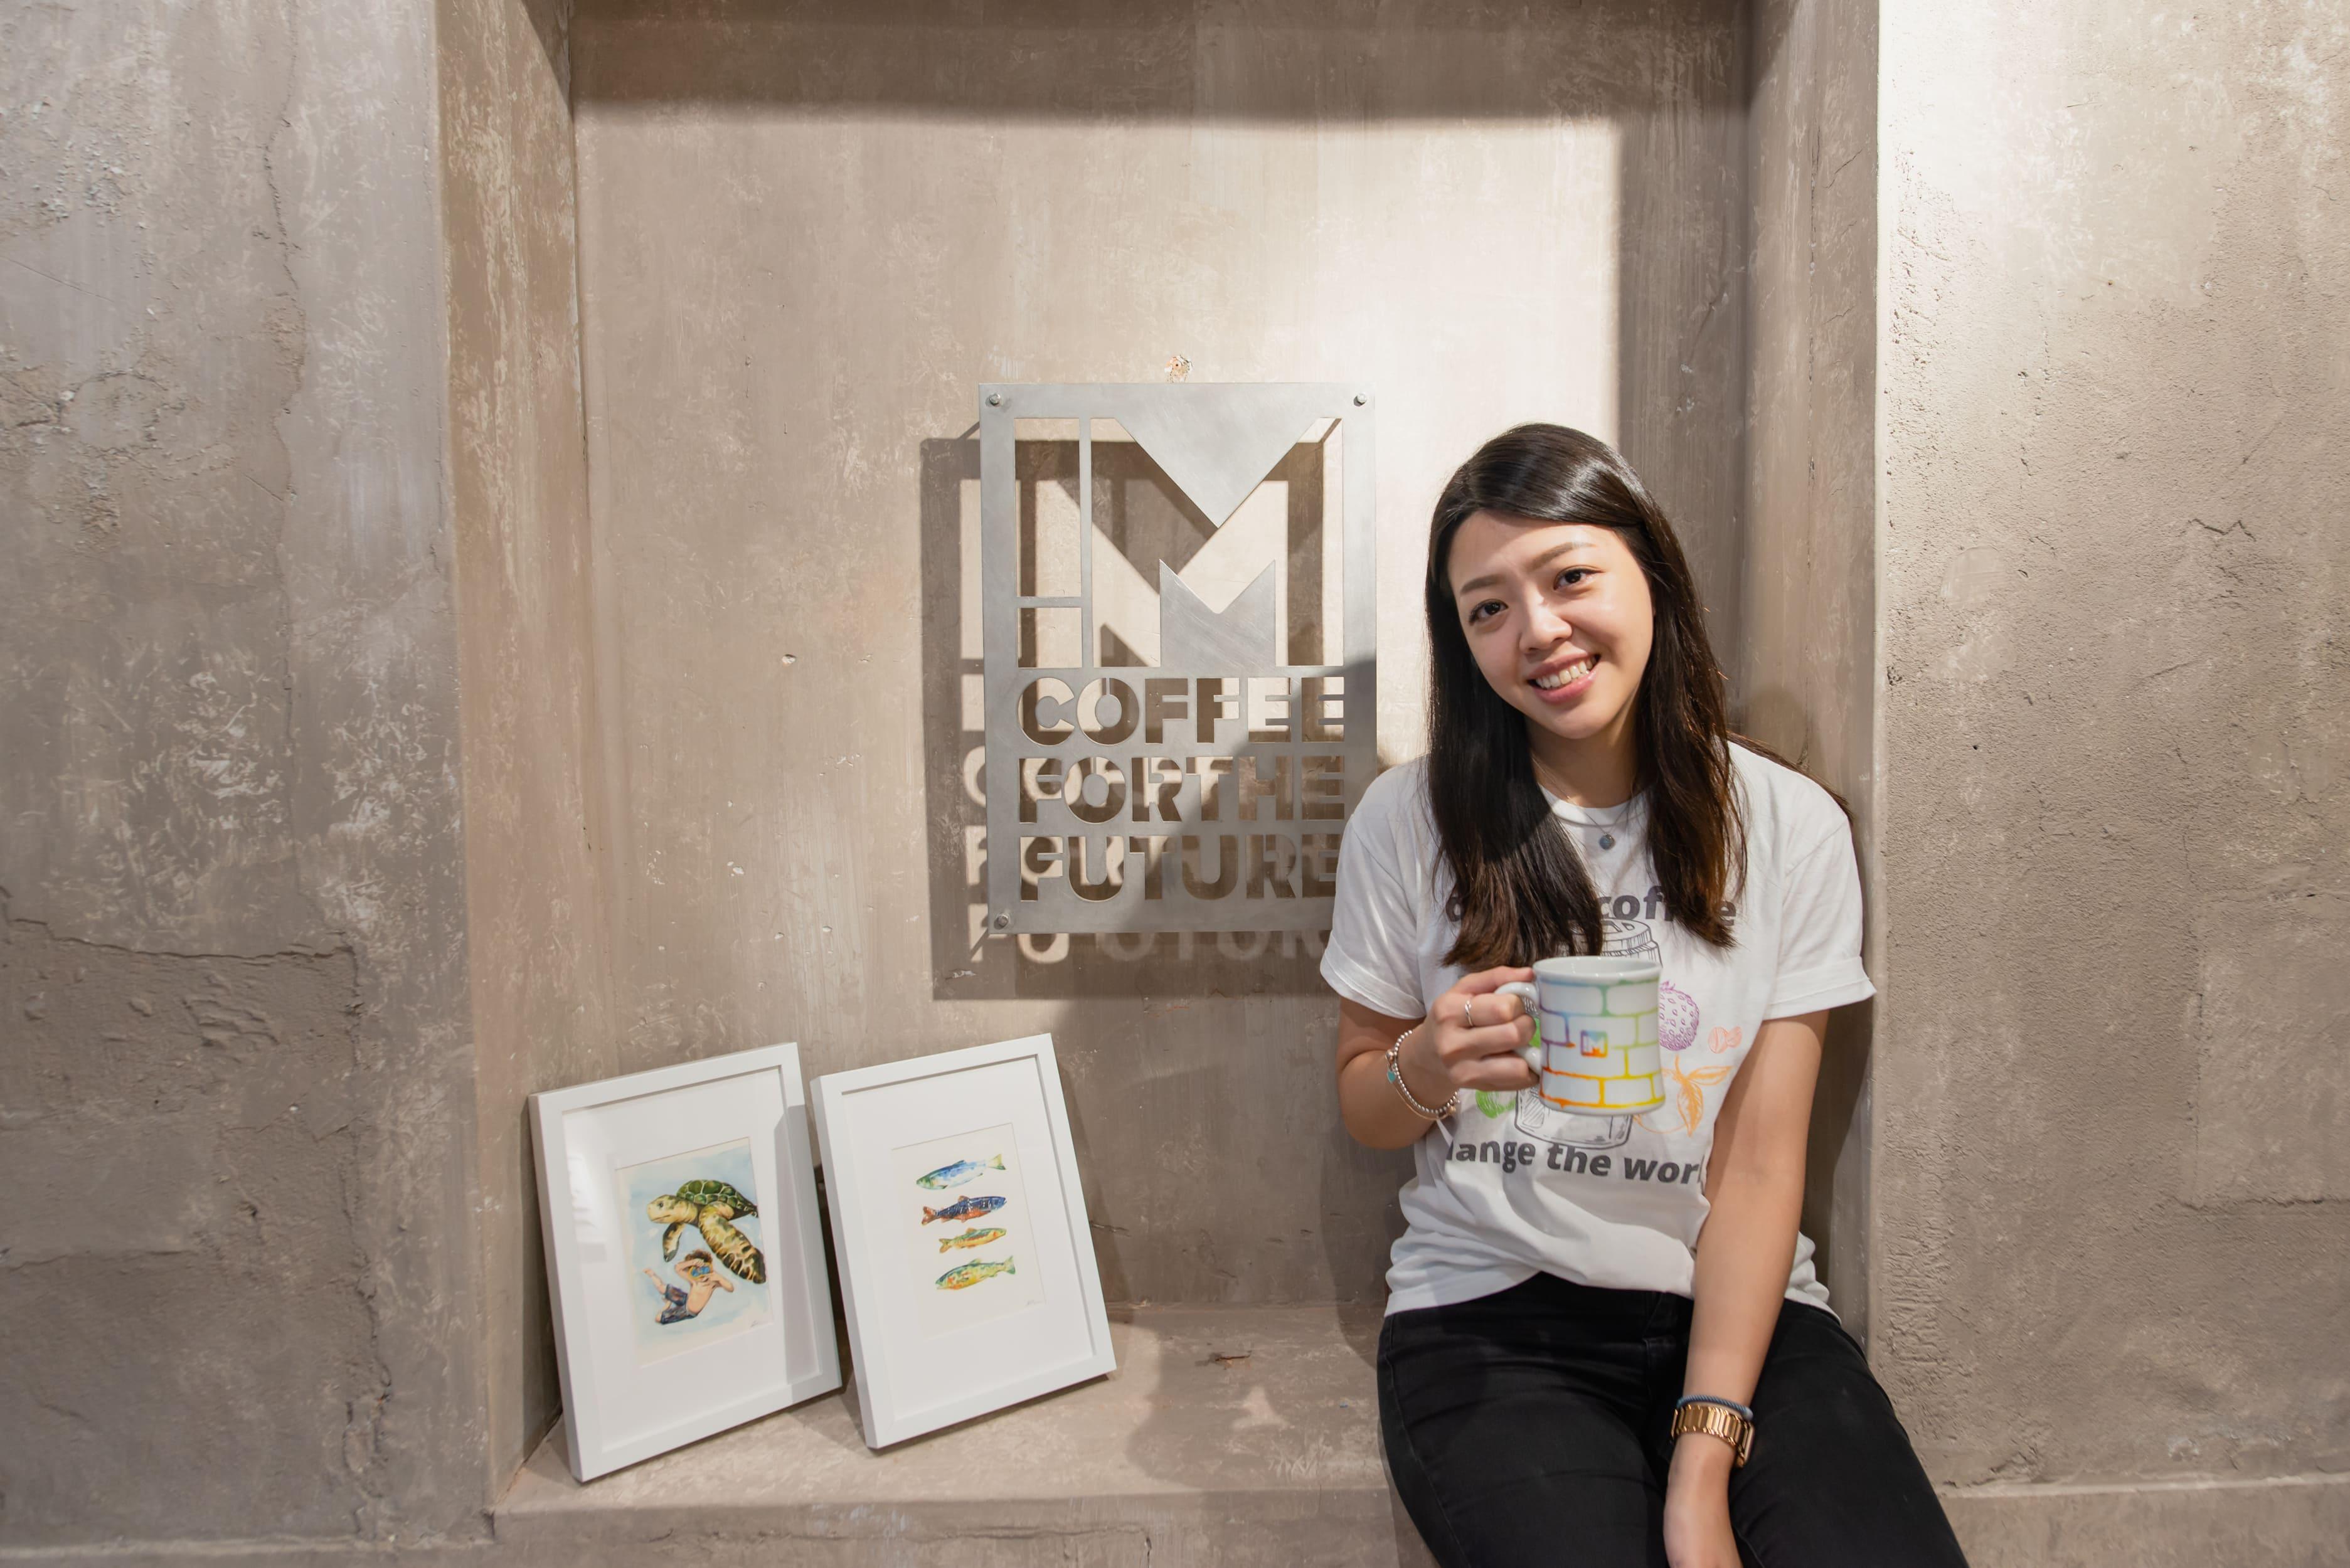 IMPCT COFFEE Jessi Fu